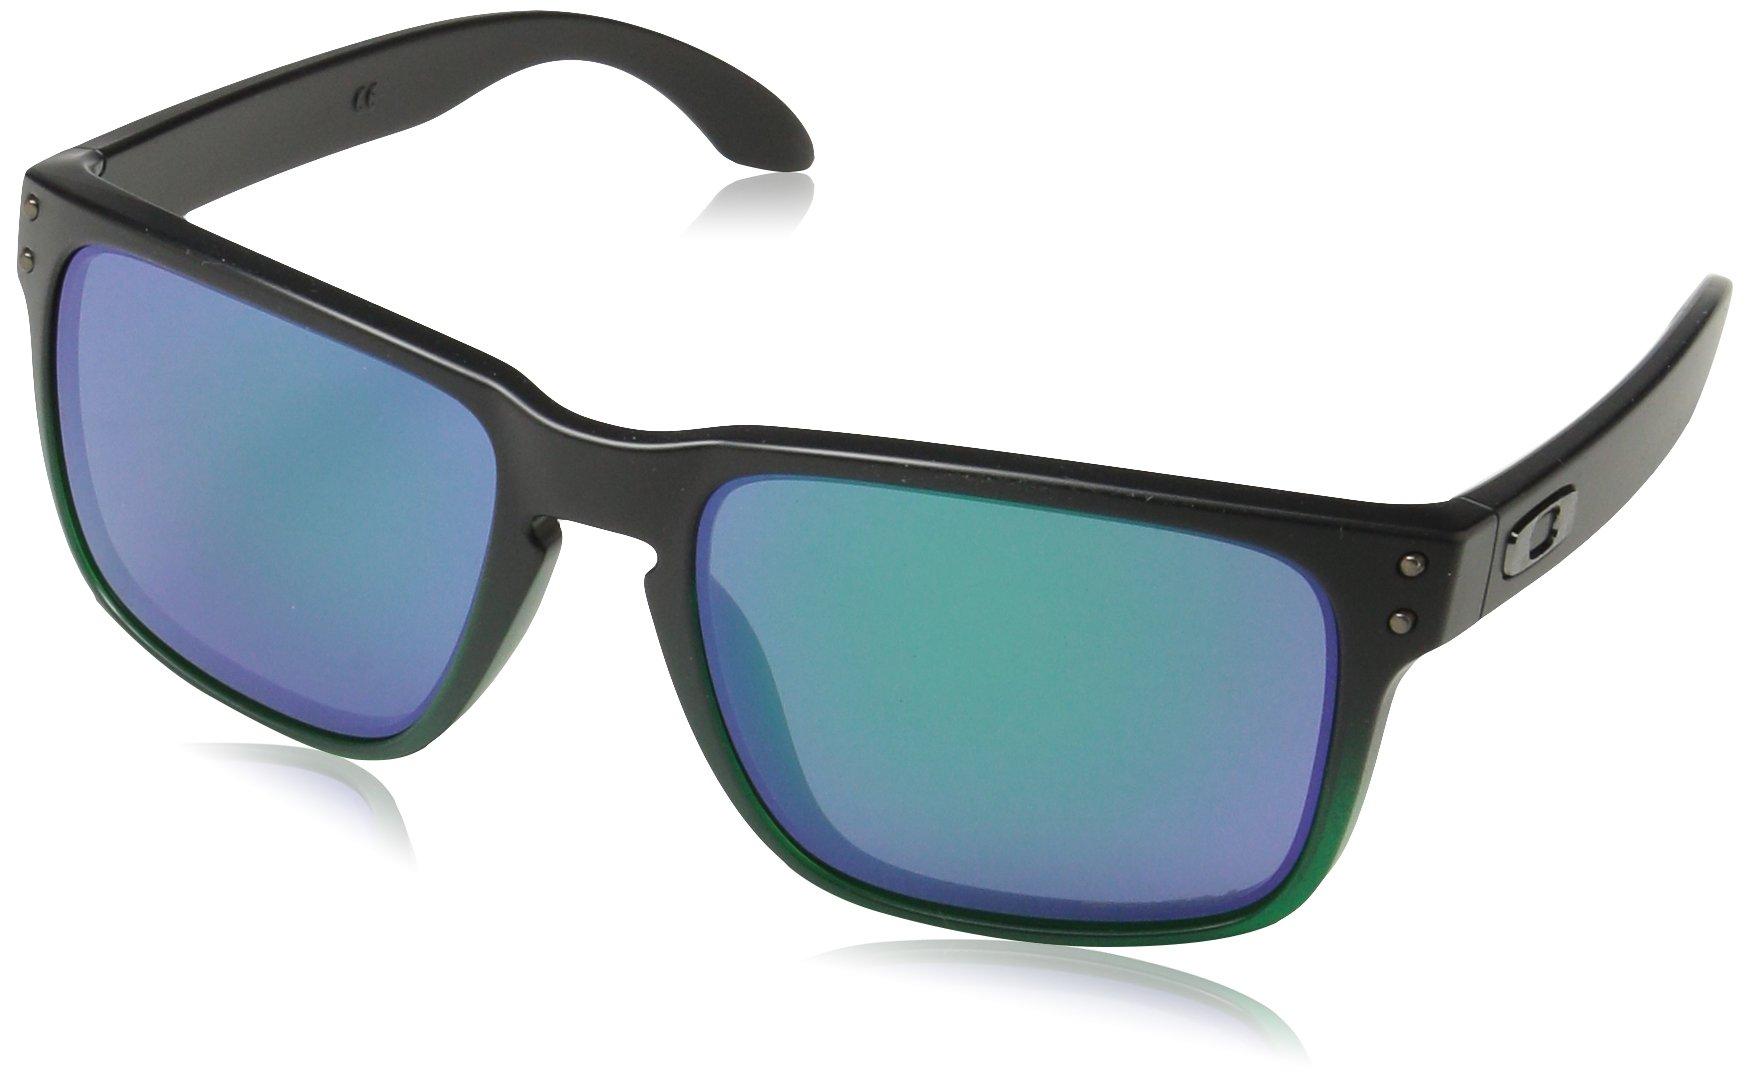 Oakley Men's Holbrook Non-Polarized Iridium Square Sunglasses, JADE FADE, 57.0 mm